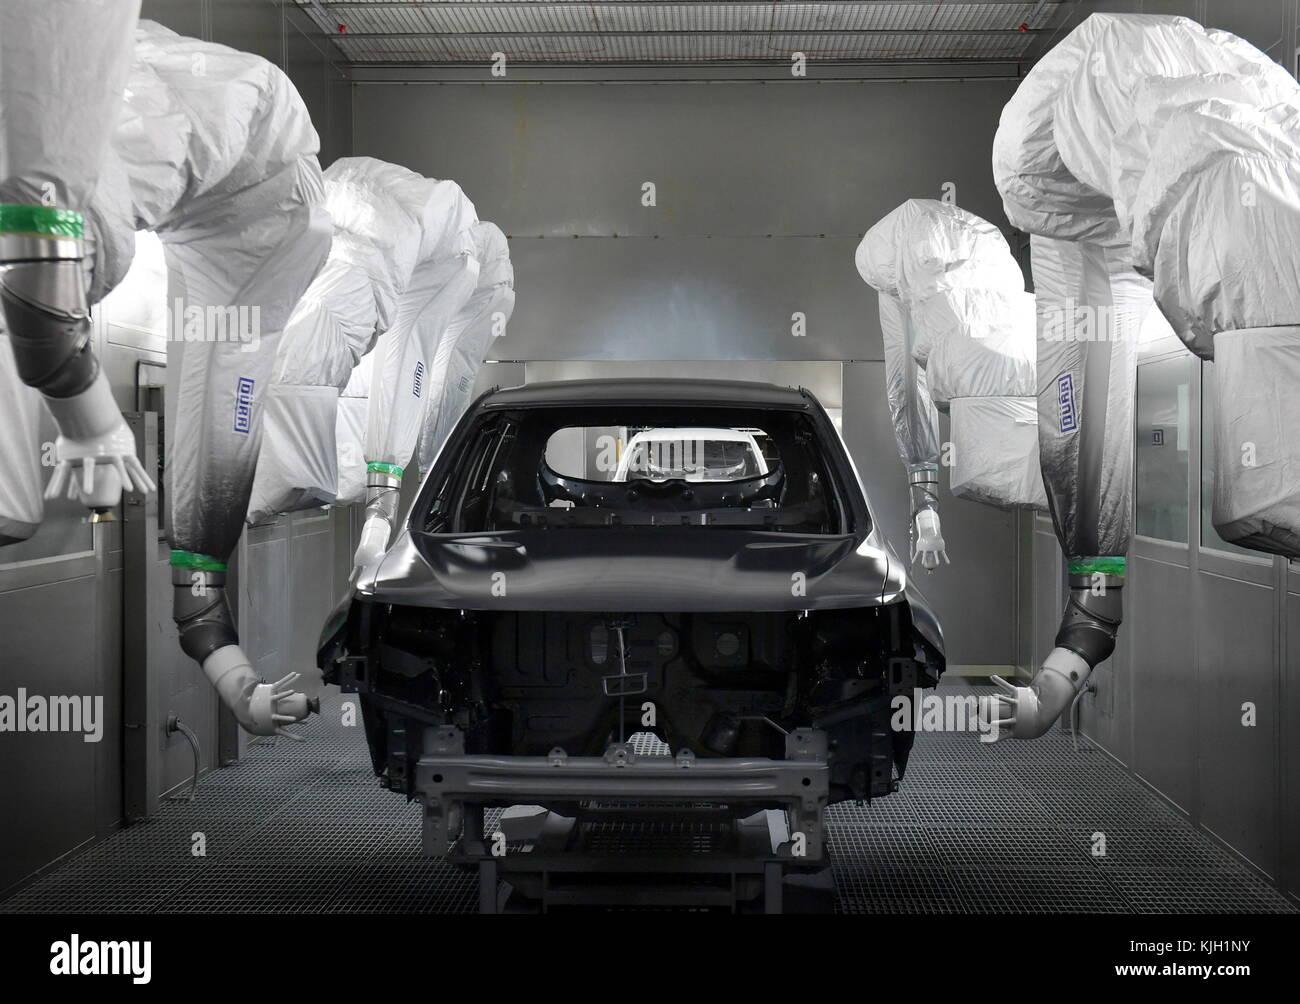 Components Car Stockfotos & Components Car Bilder - Seite 3 - Alamy